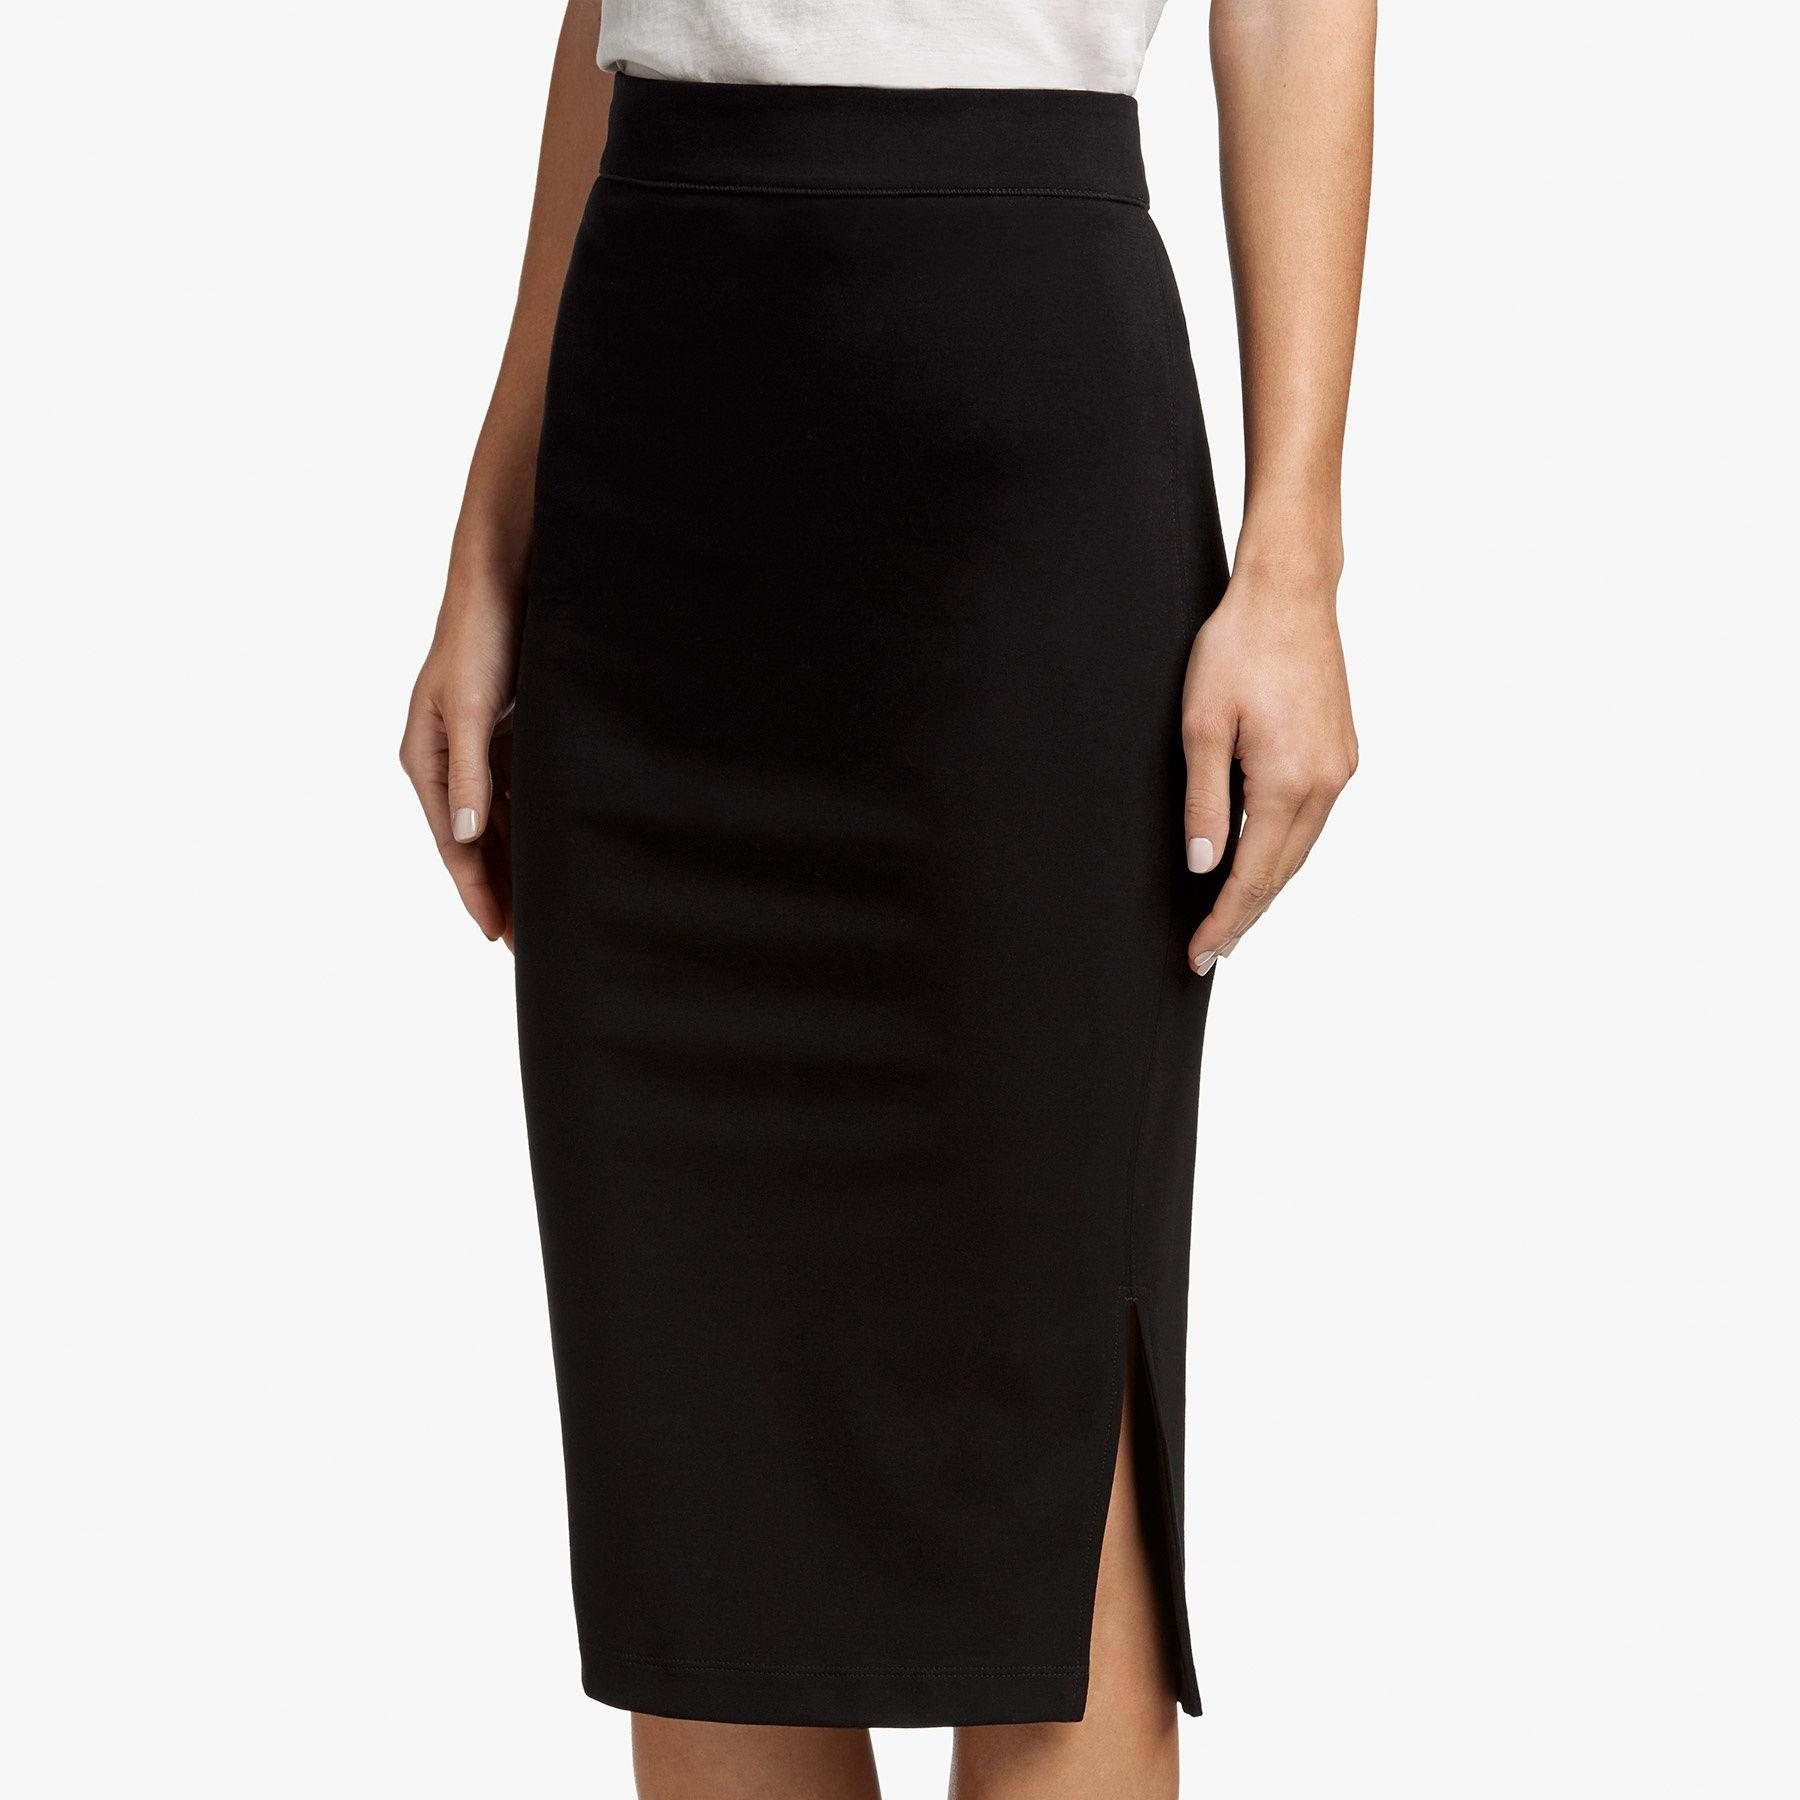 a45257b64c James Perse Side Split Pencil Skirt in Black - Lyst